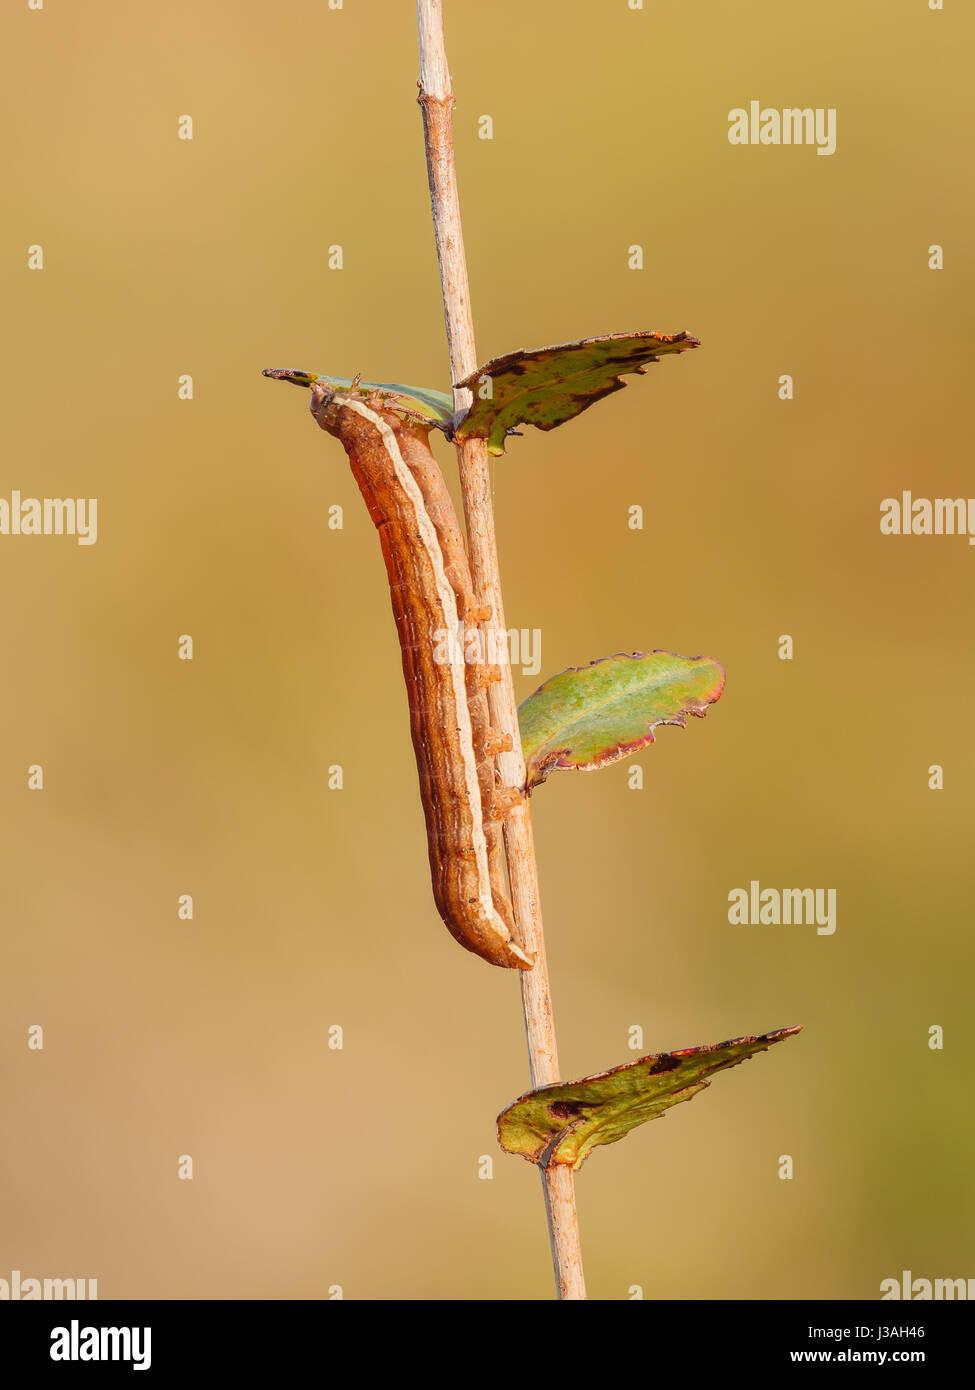 A Gray Half-Spot (Nedra ramosula) caterpillar (larva) feeding on St. Johnswort. - Stock Image